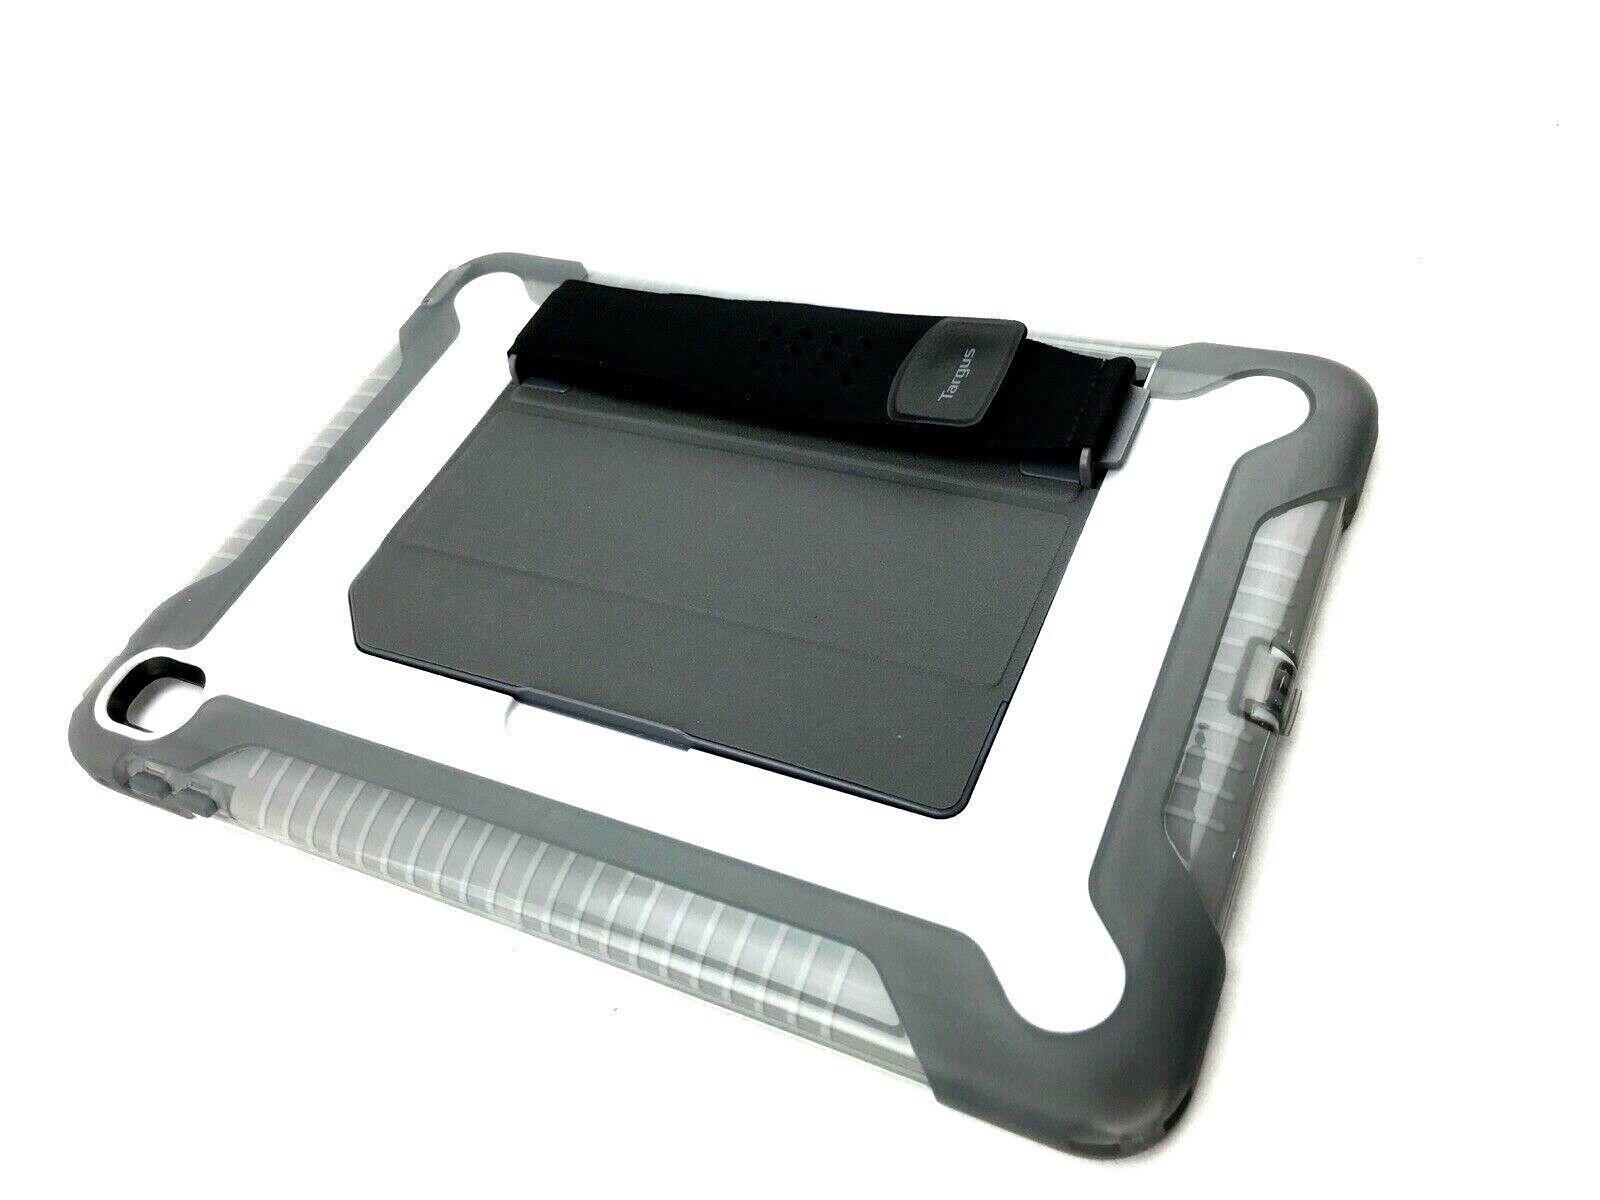 Targus SafePort Rugged Tablet Case for iPad , 9.7-Inch iPad